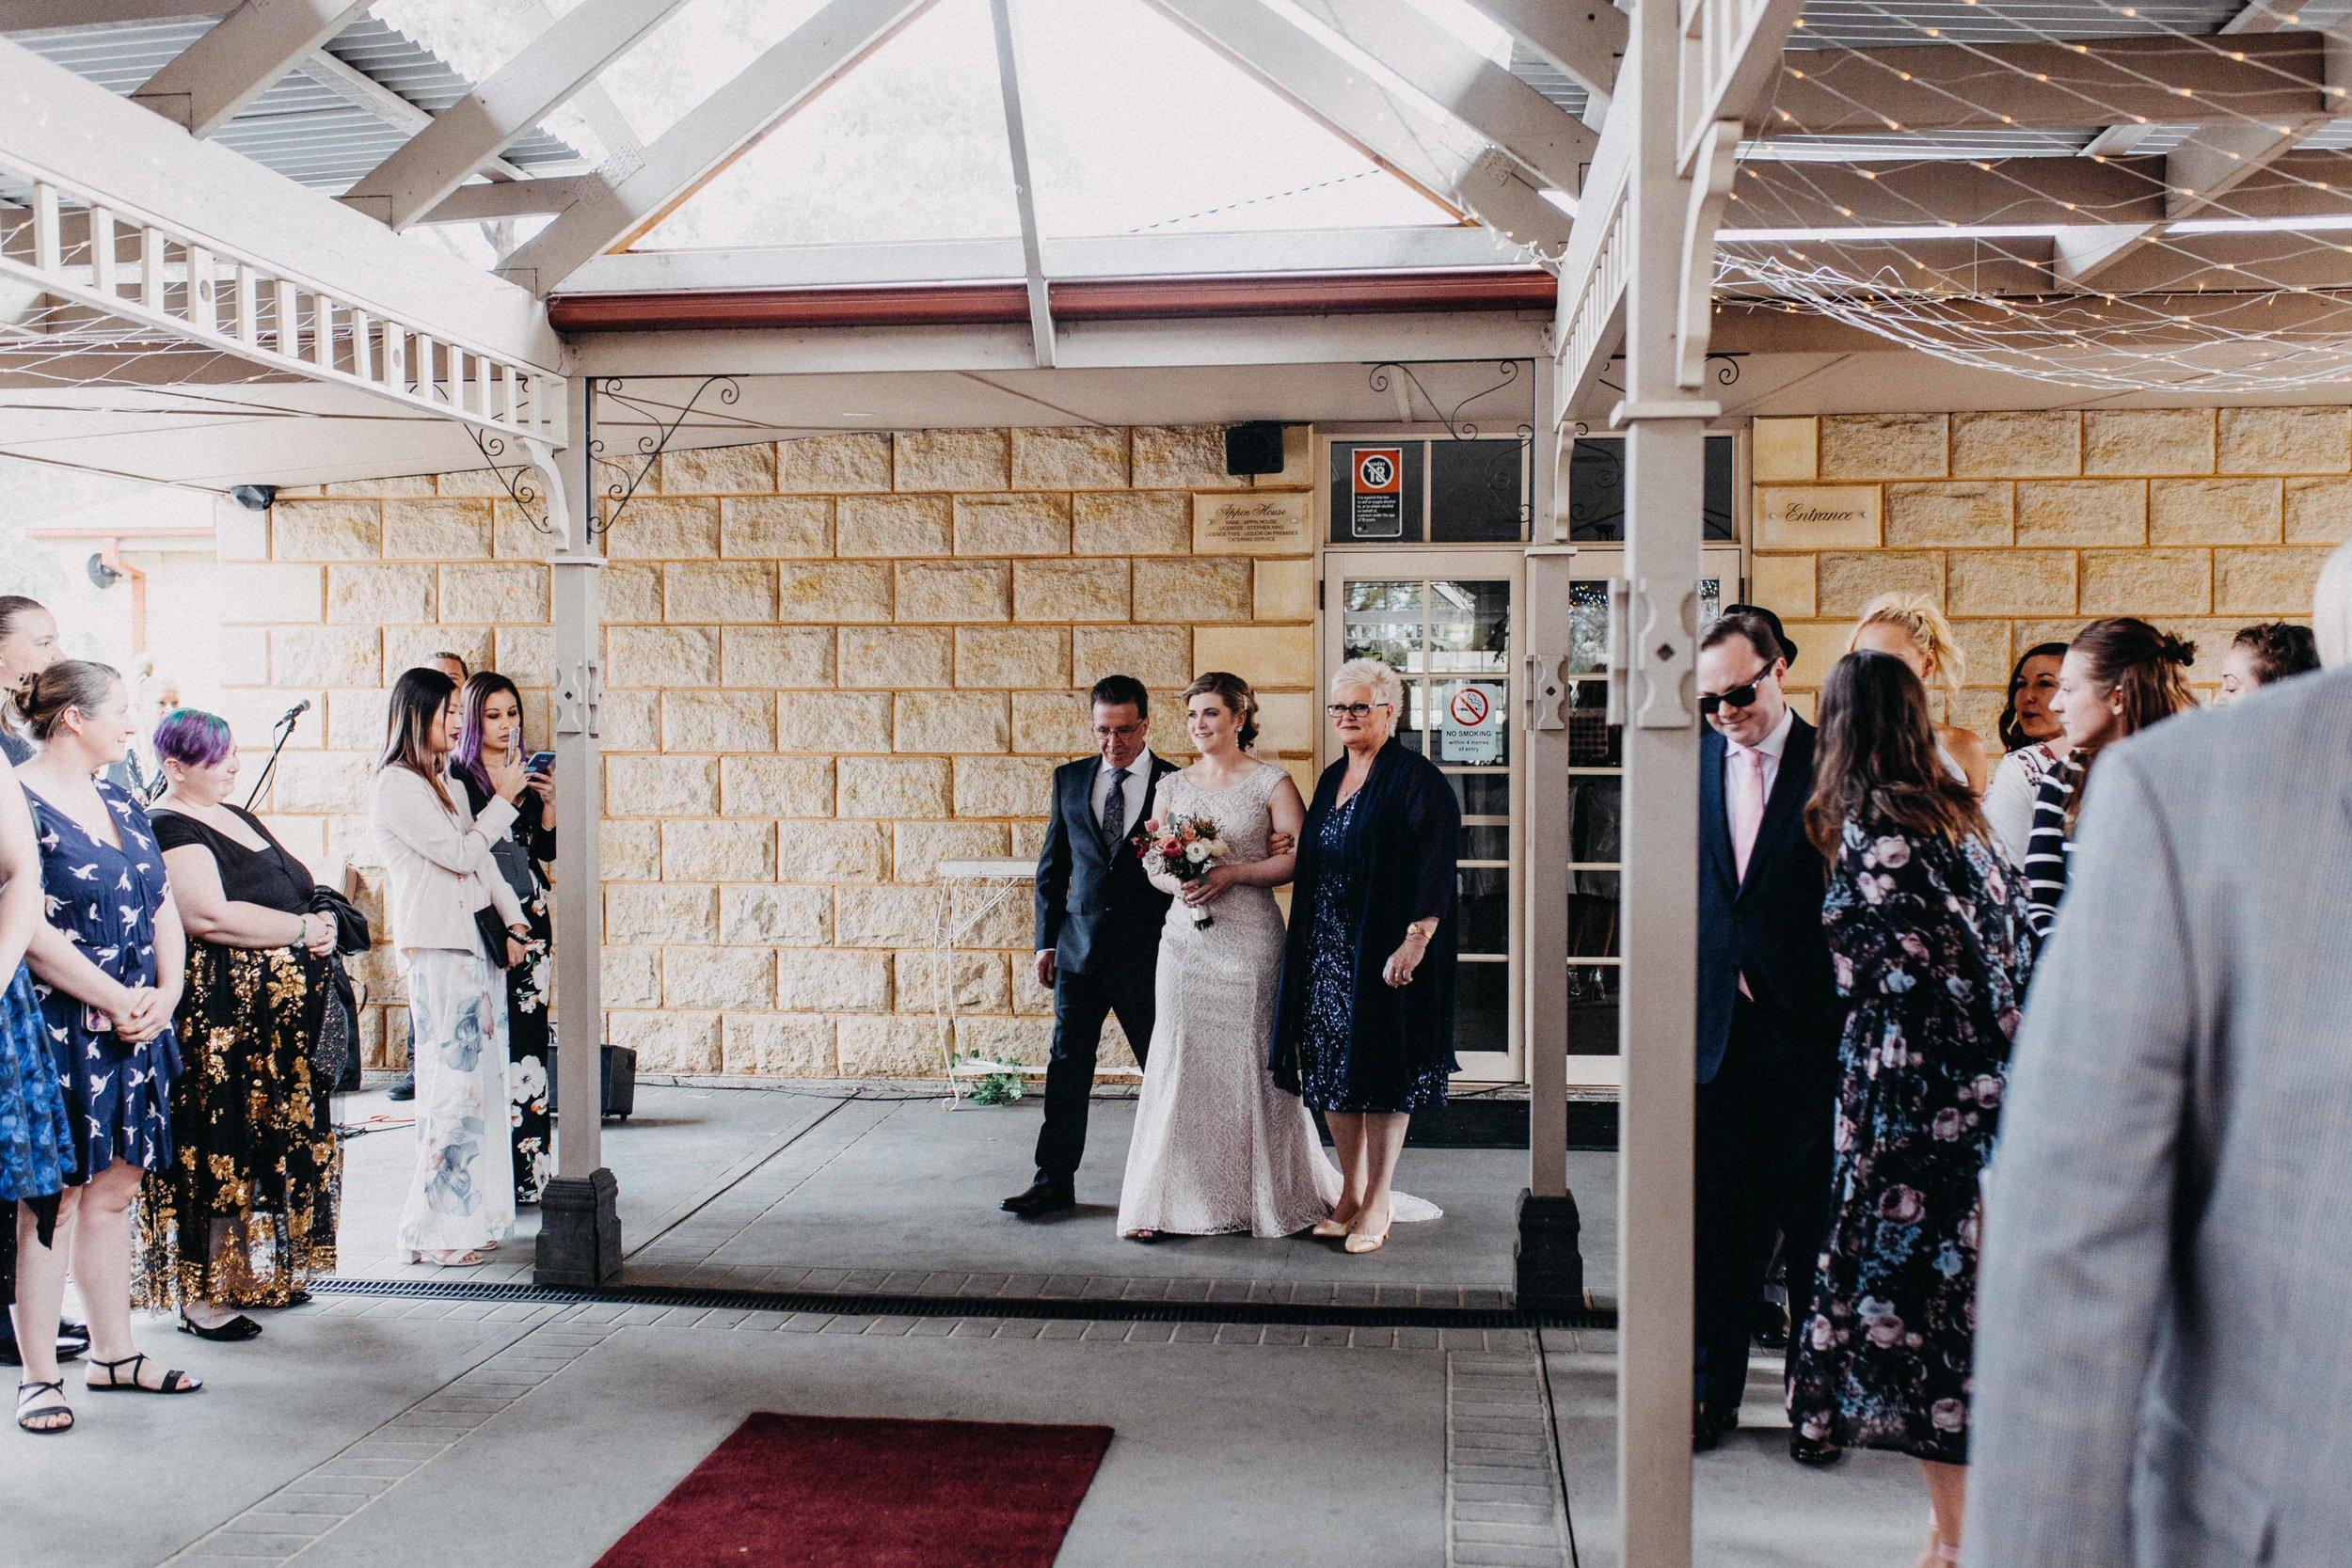 appin-house-wedding-macarthur-www.emilyobrienphotography.net-68.jpg